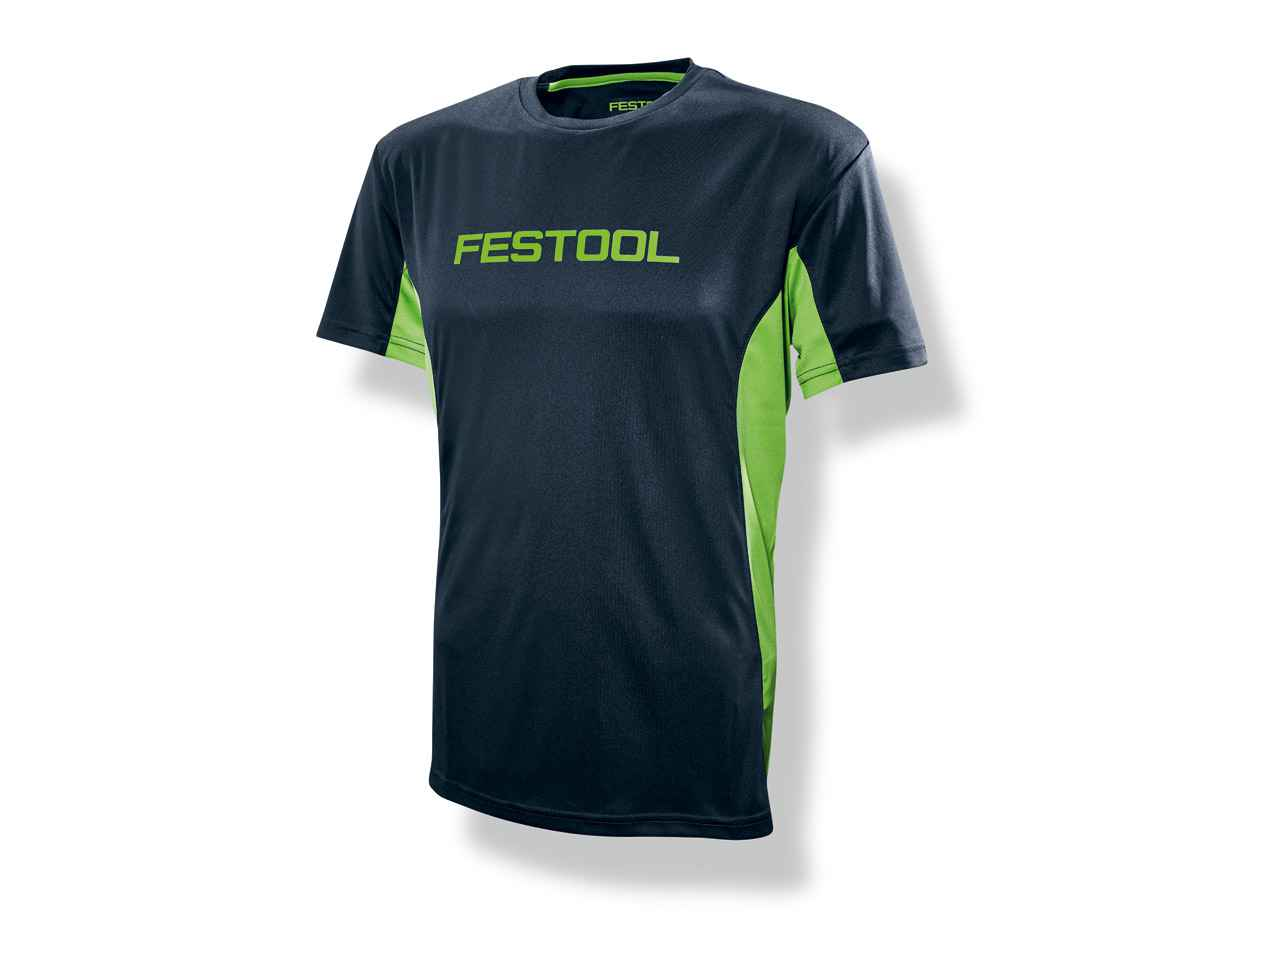 Festool_204002.jpg